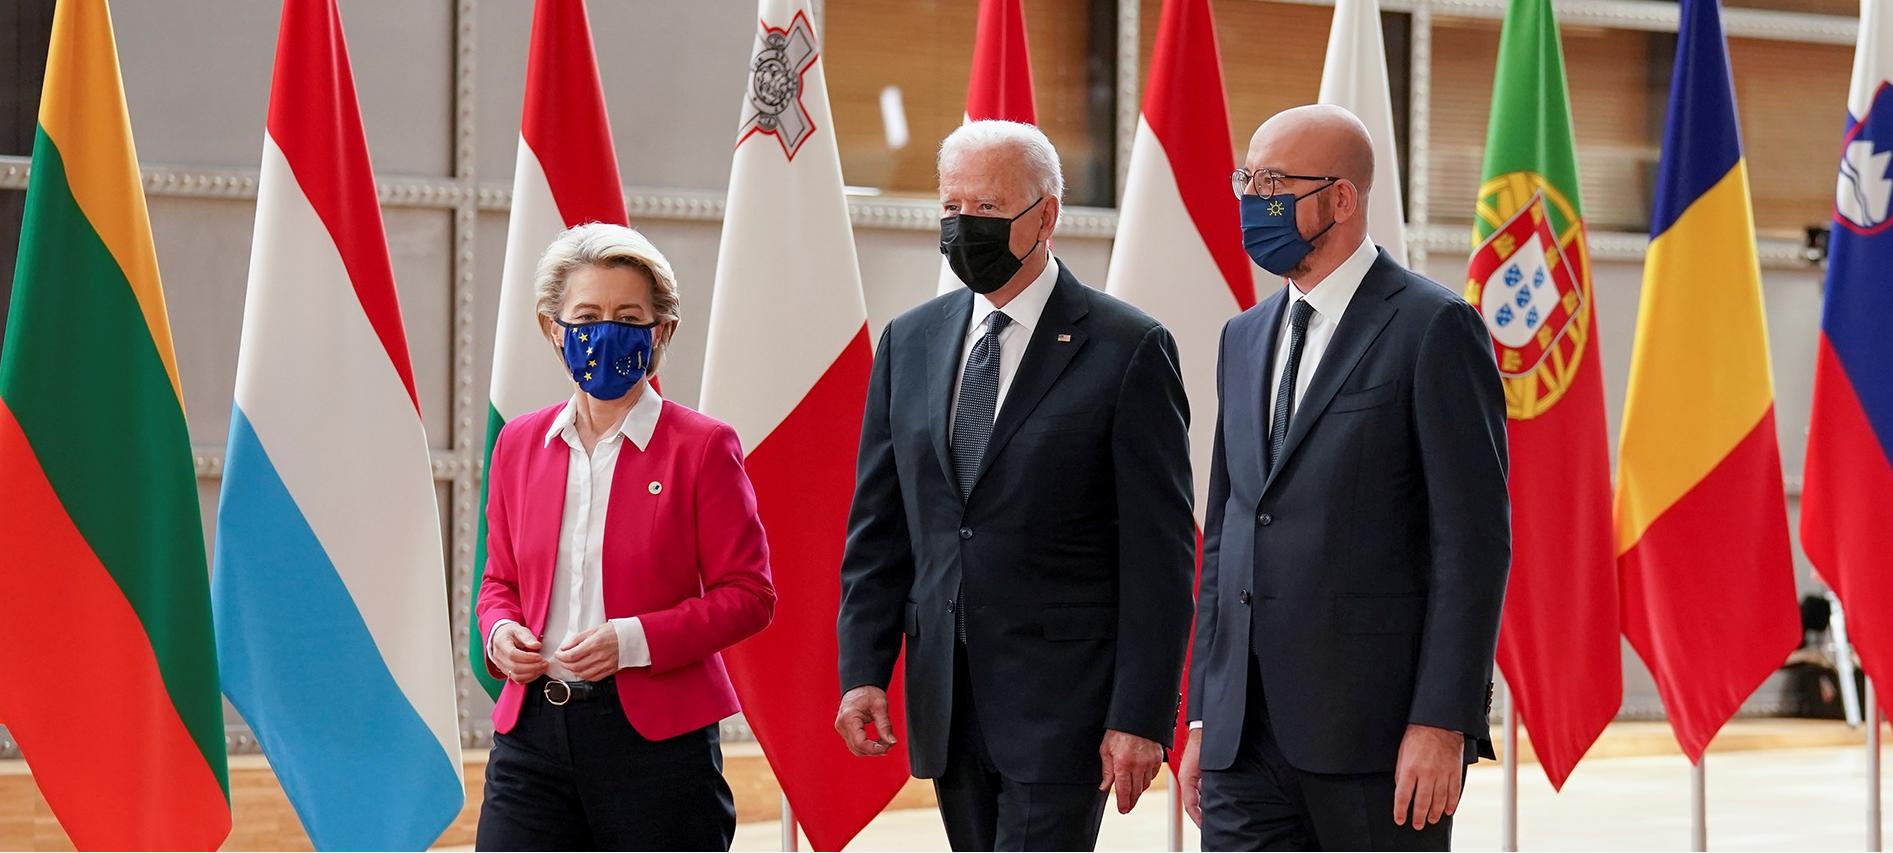 More anti-Russia posturing at EU-US summit